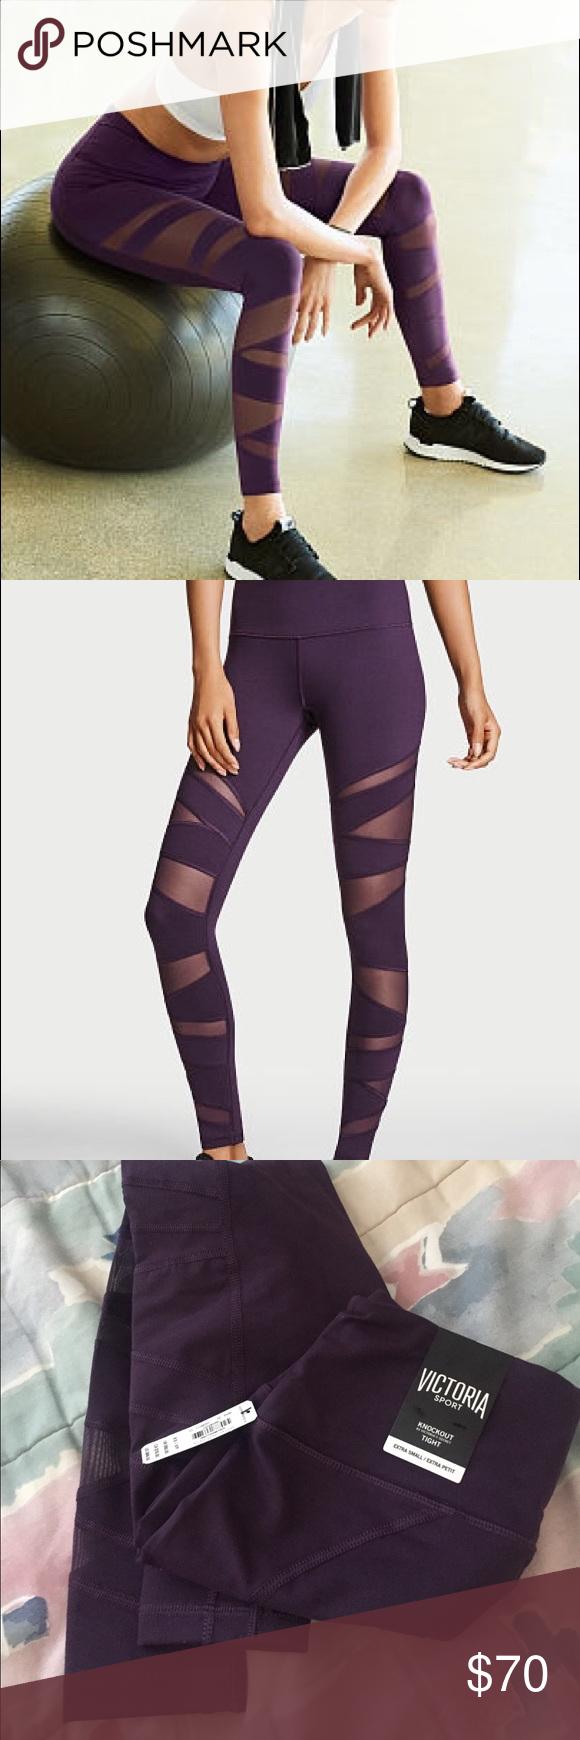 ca988d1c111e0 Victorias Secret Sport knockout mesh wrap leggings Size XS. BNWT brand new  with tags Victoria